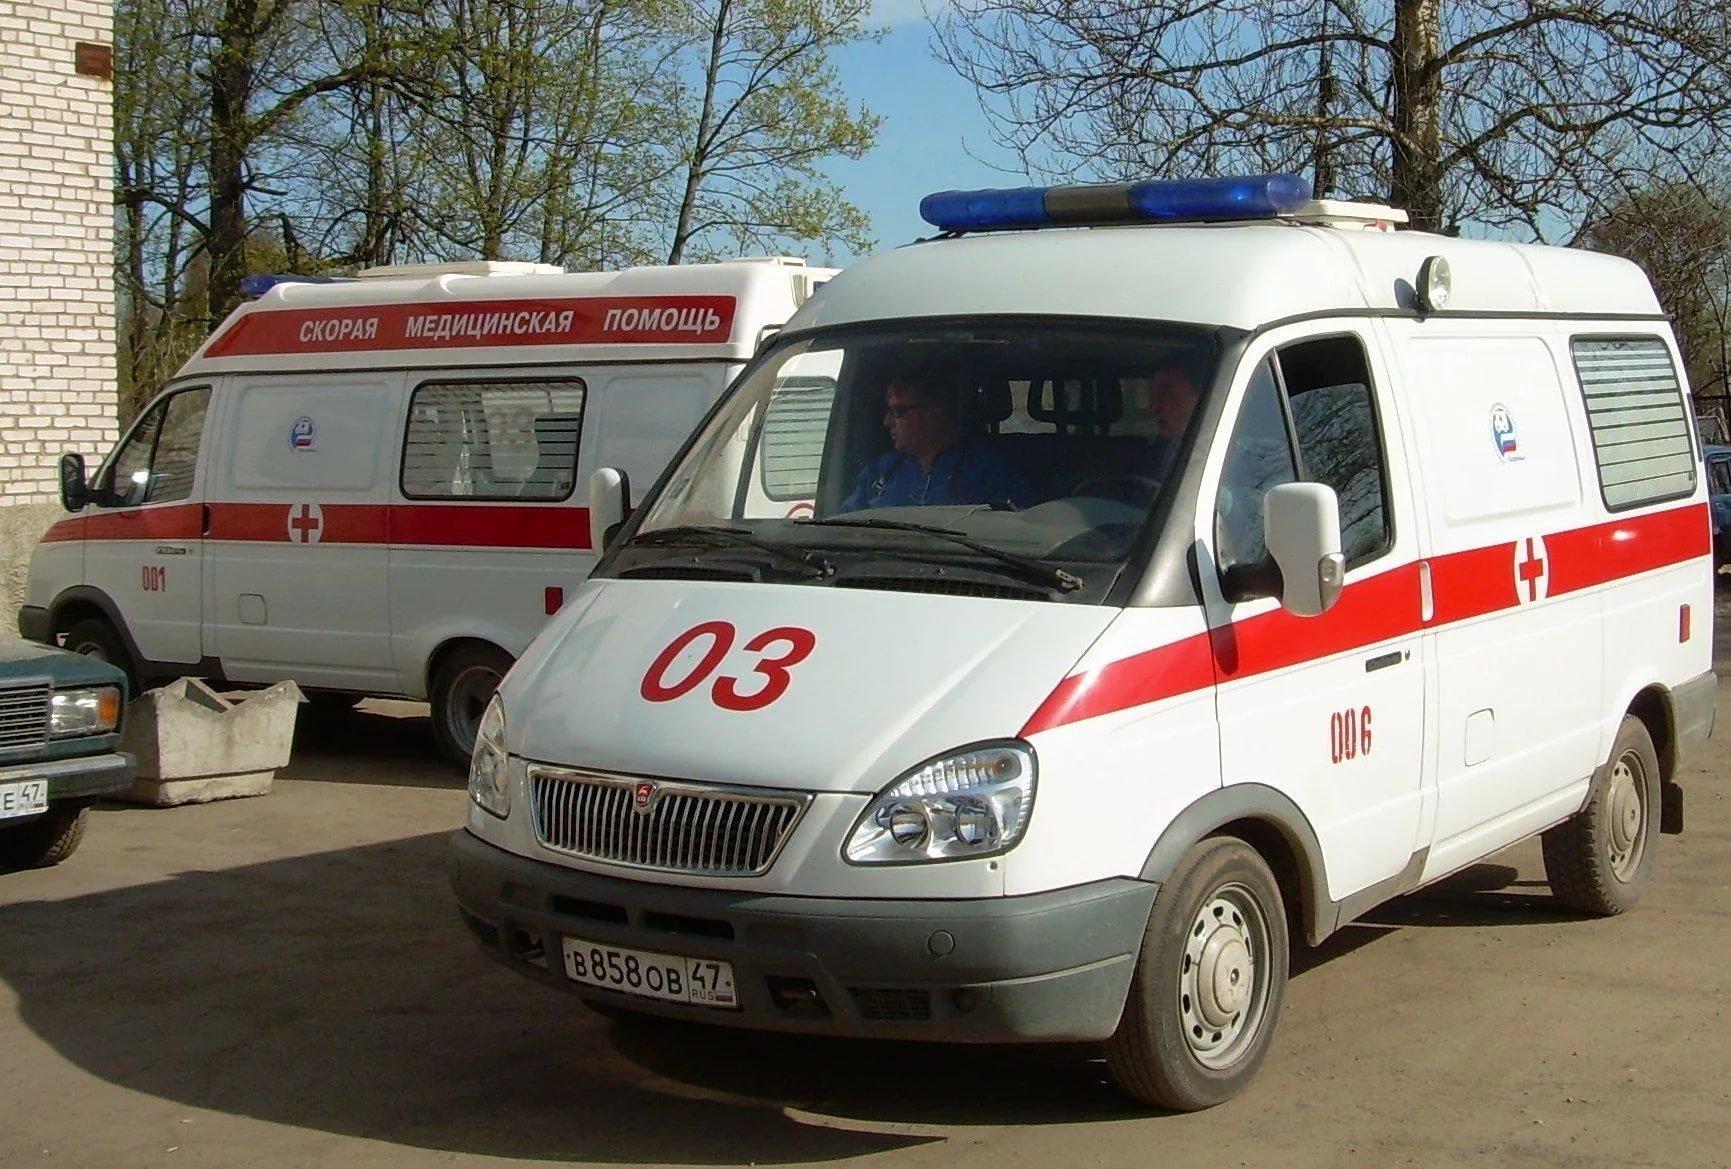 В столице России мужчина выпал изокна прямо наребенка